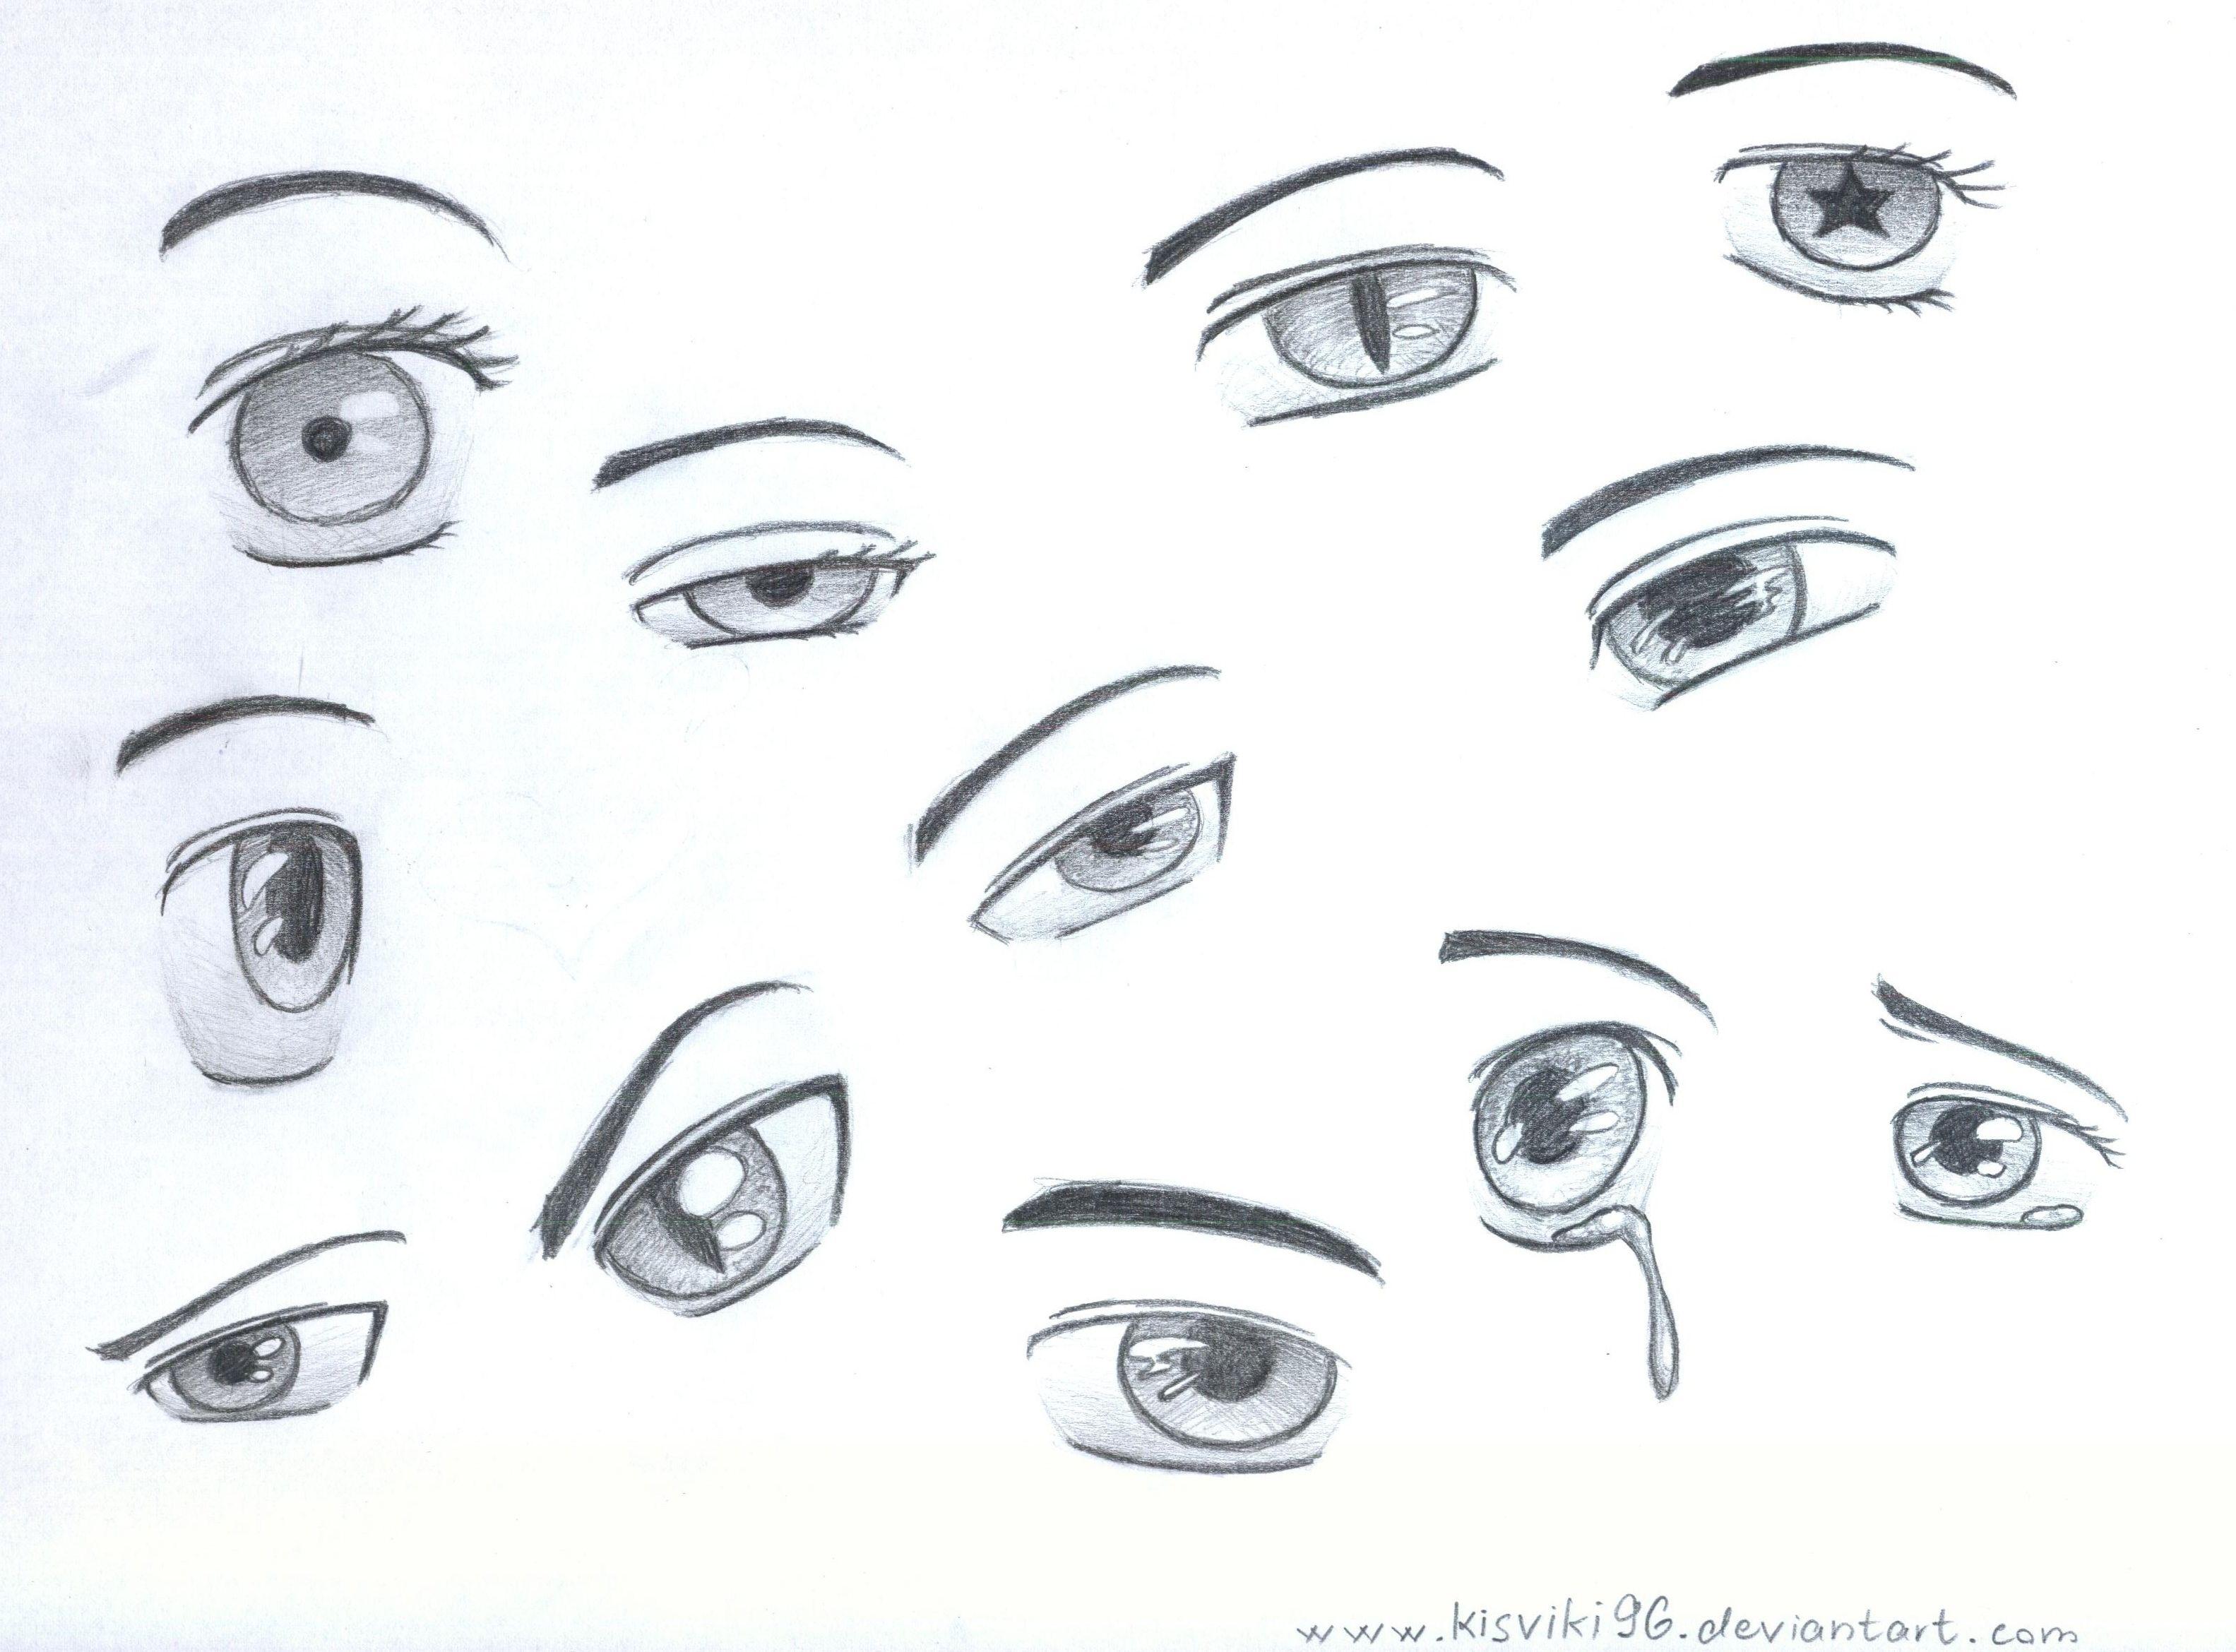 Anime Eyes By Kisviki96 D33zr89 Jpg 3166 2339 Anime Eyes How To Draw Anime Eyes Anime Guys Shirtless